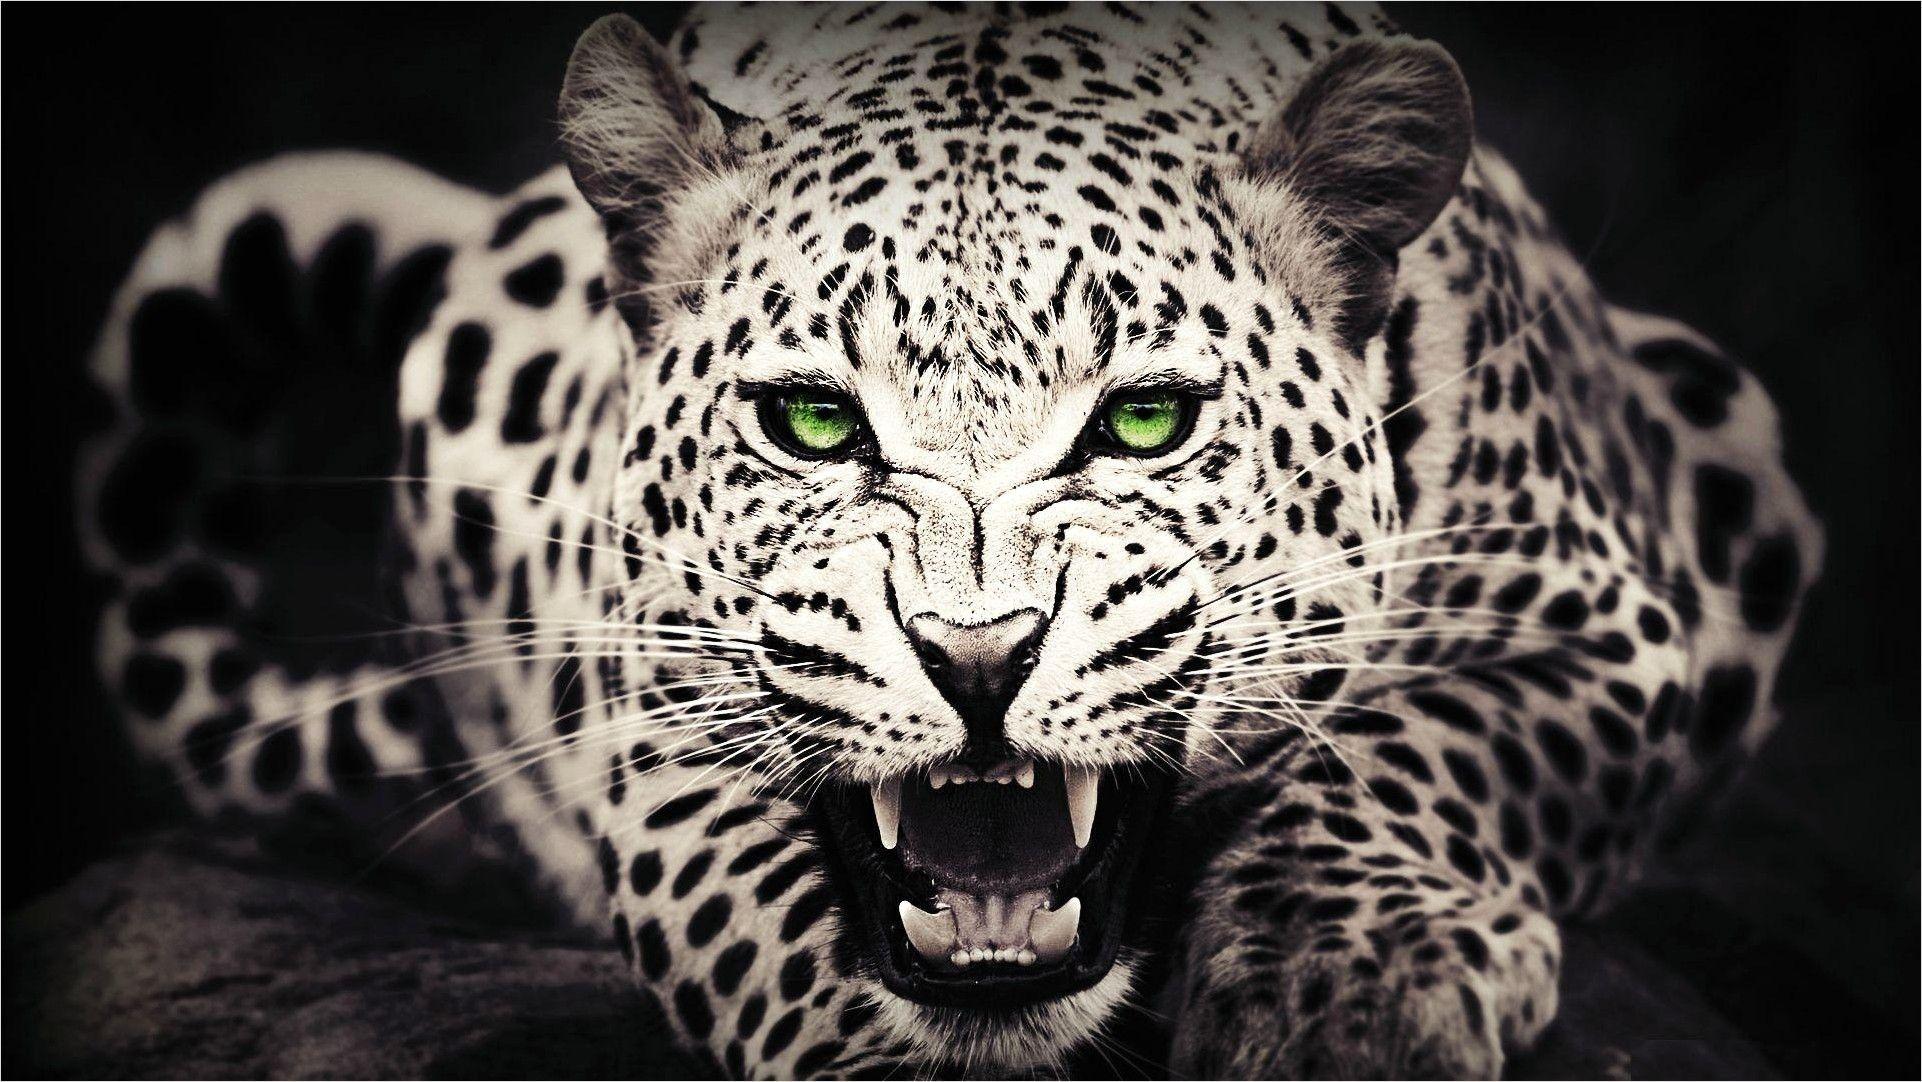 4k Animal Wallpaper For Laptop Trend Cheetah Wallpaper Wild Animal Wallpaper Leopard Wallpaper